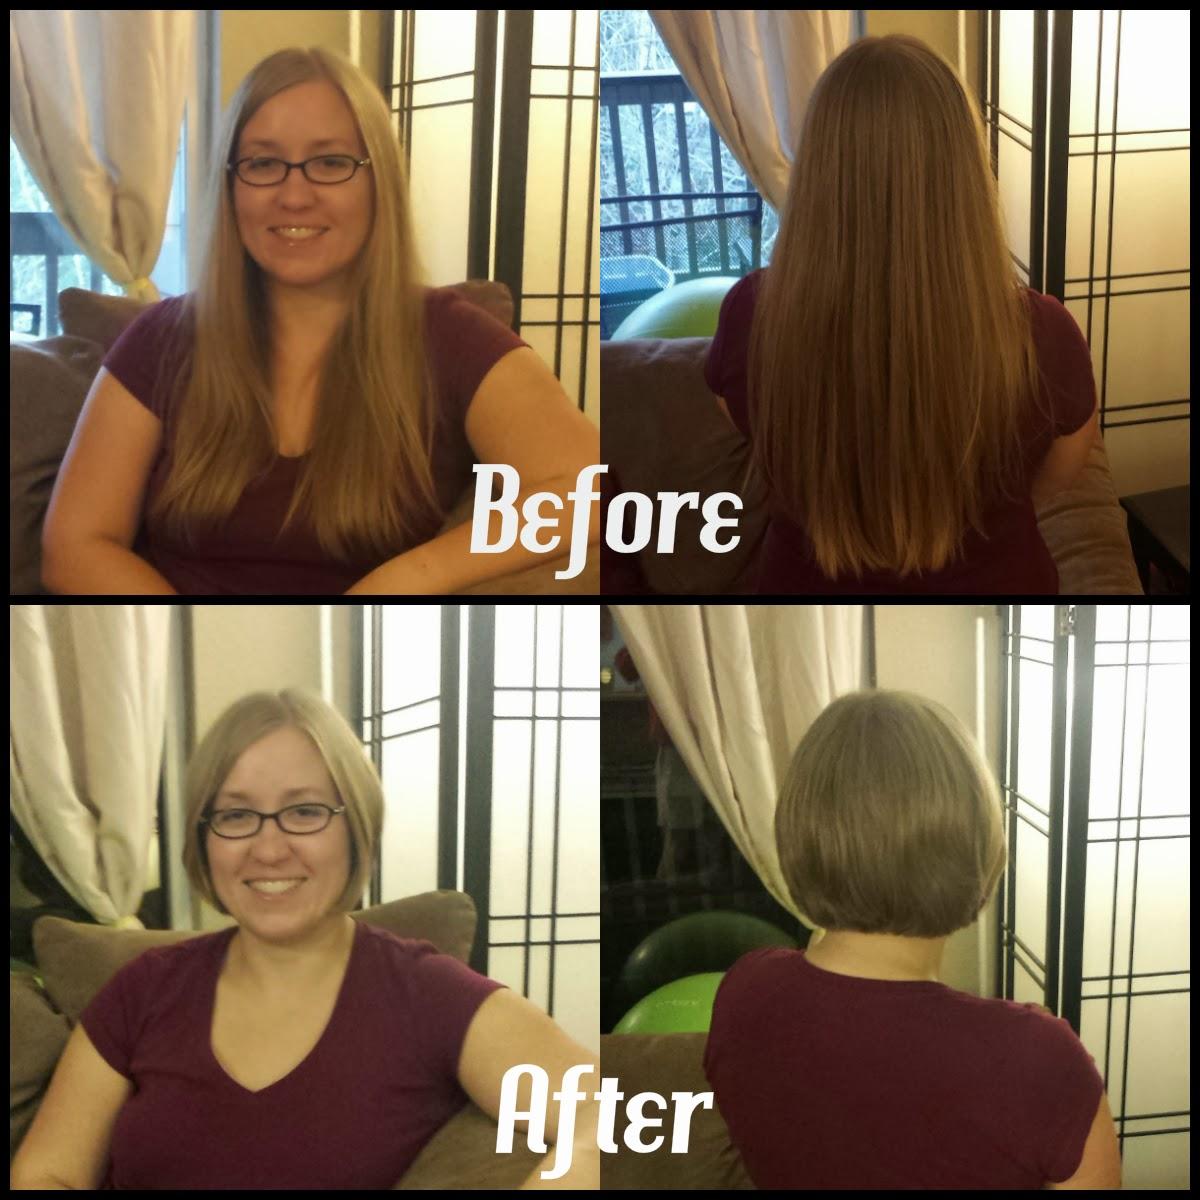 Balancing Meanderings Donating Hair To Cwhl